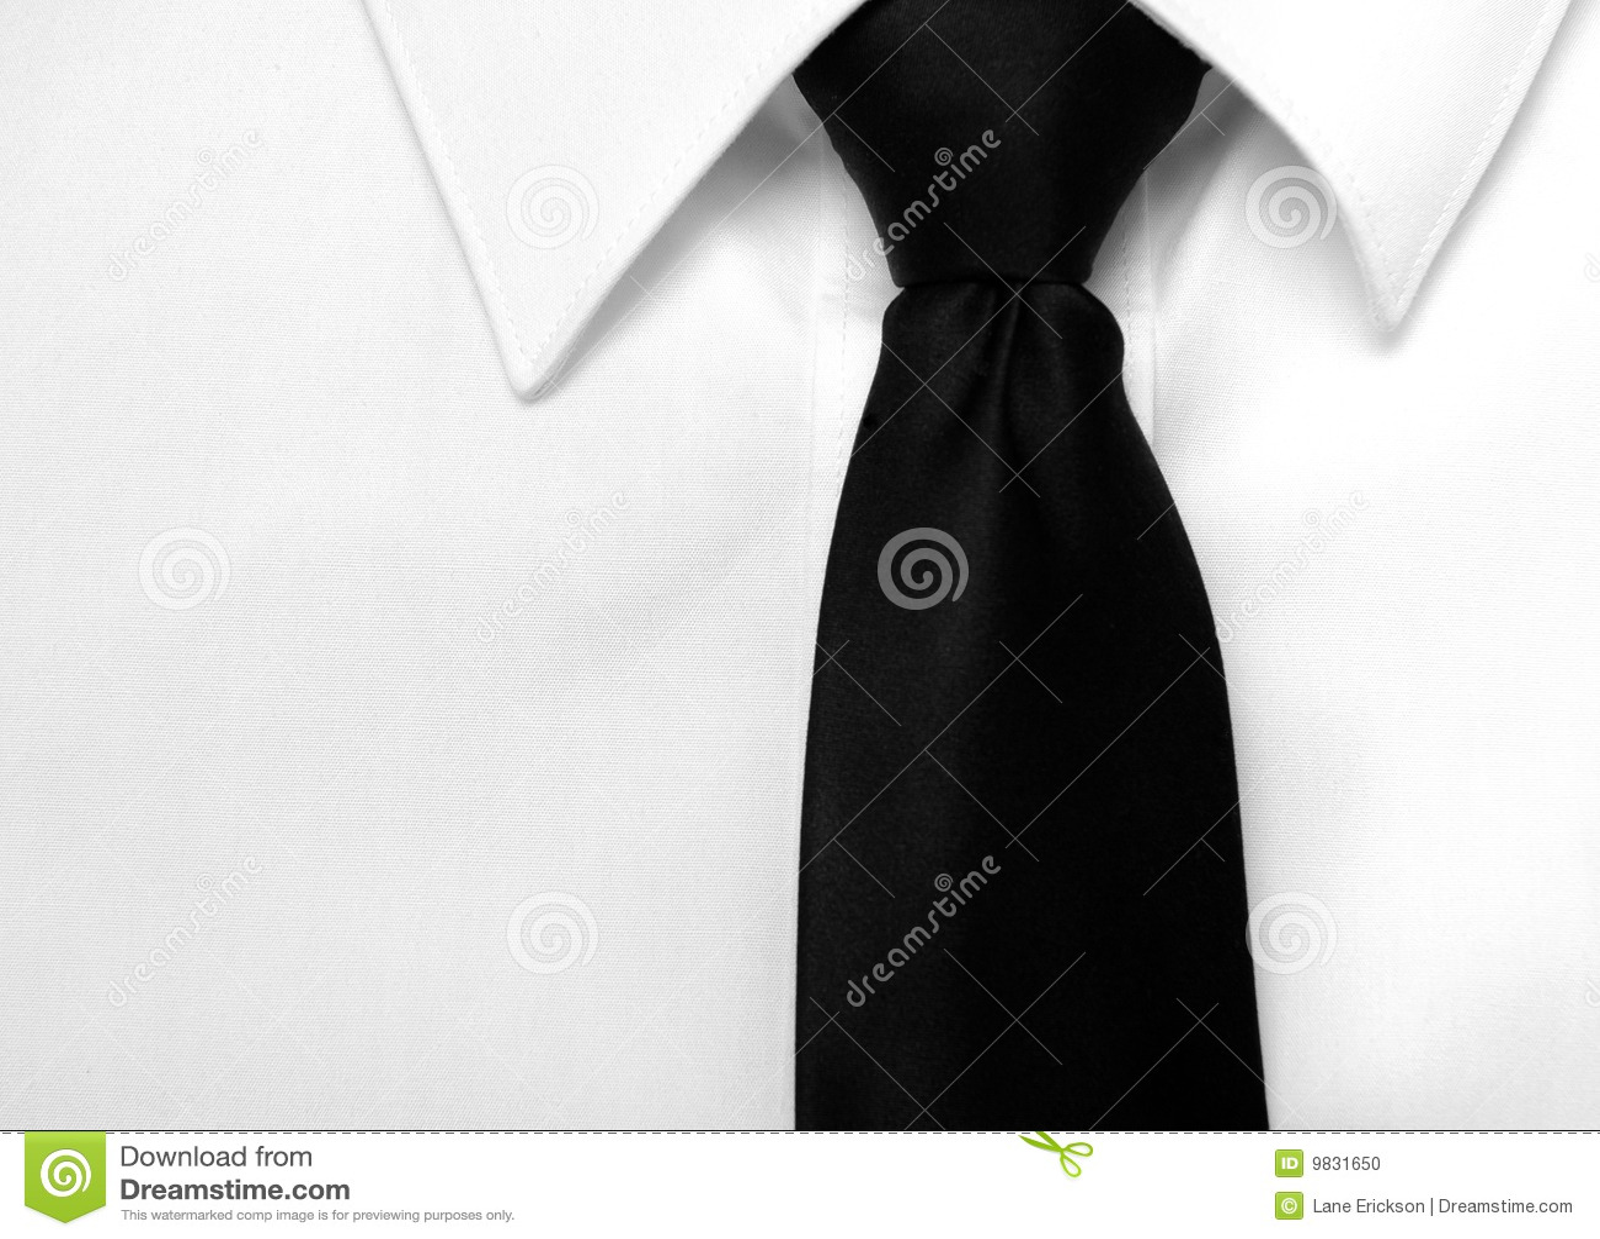 Dress shirt black tie stock photo image 9831650 for Black shirt and black tie